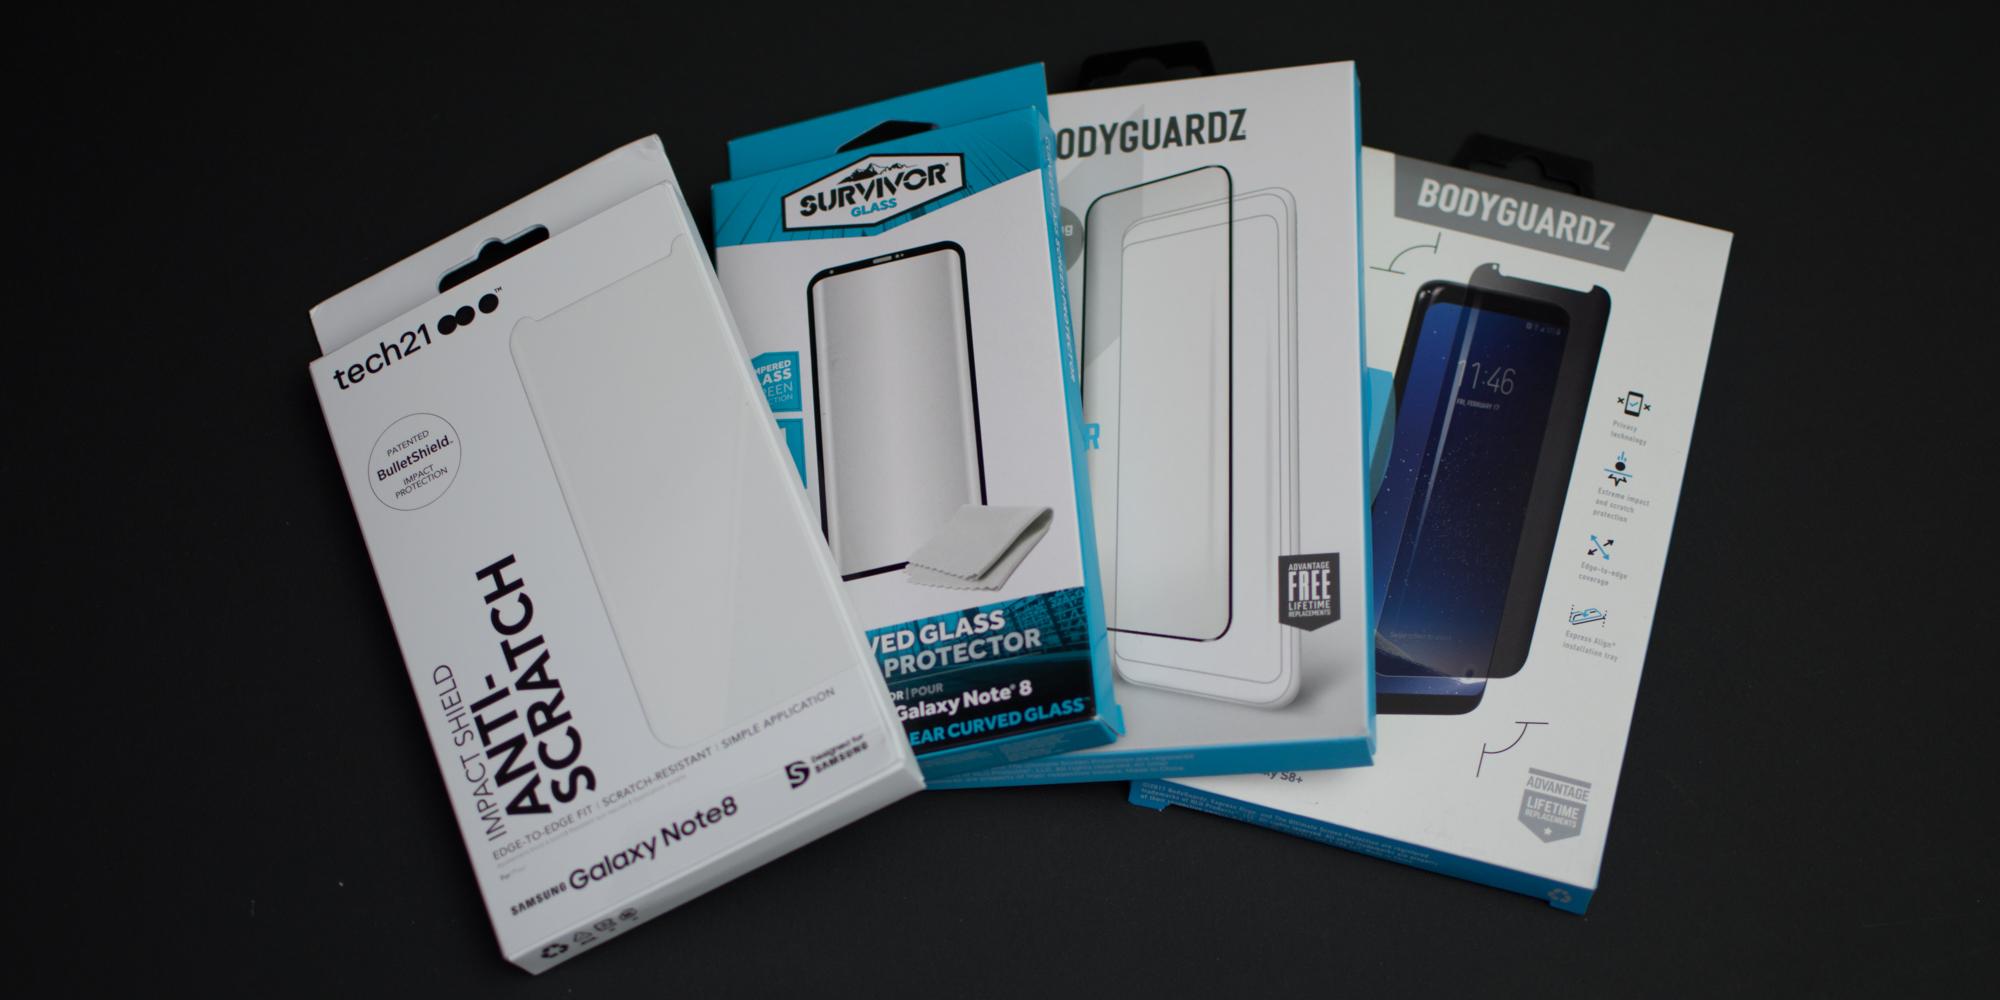 Samsung Galaxy Note 8: Best screen protectors